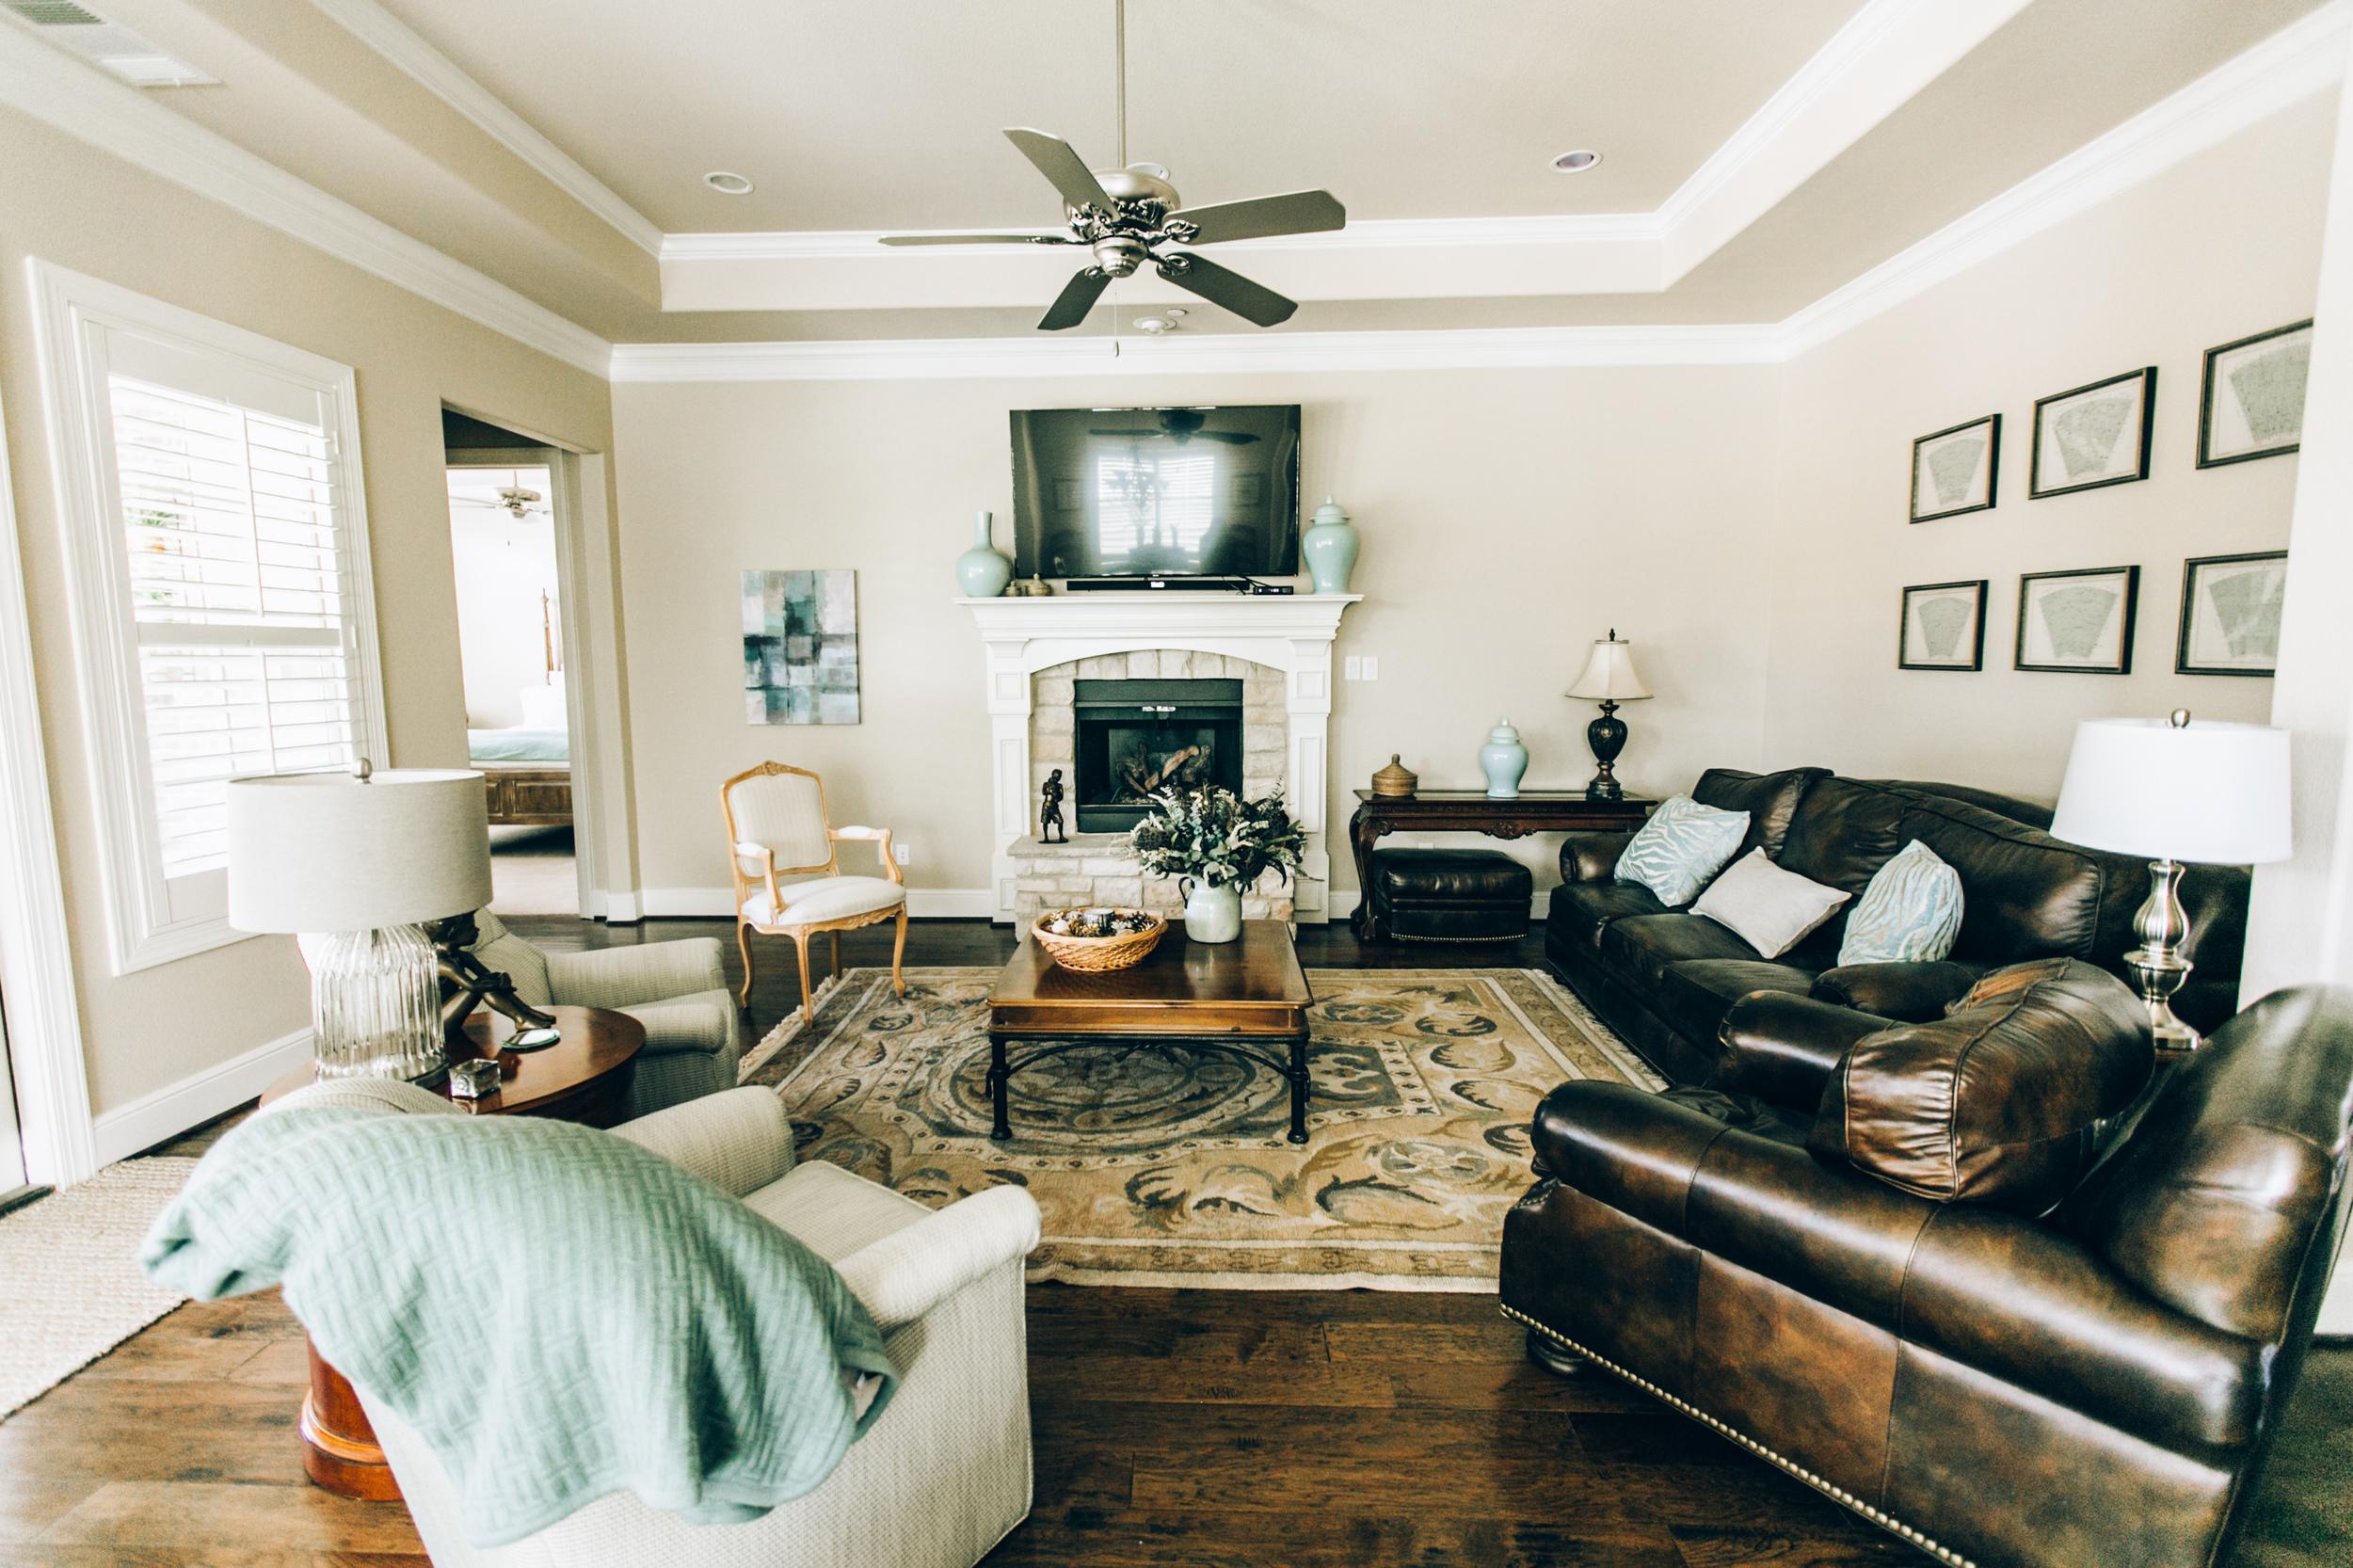 interior-design-home-decorating-324.jpg